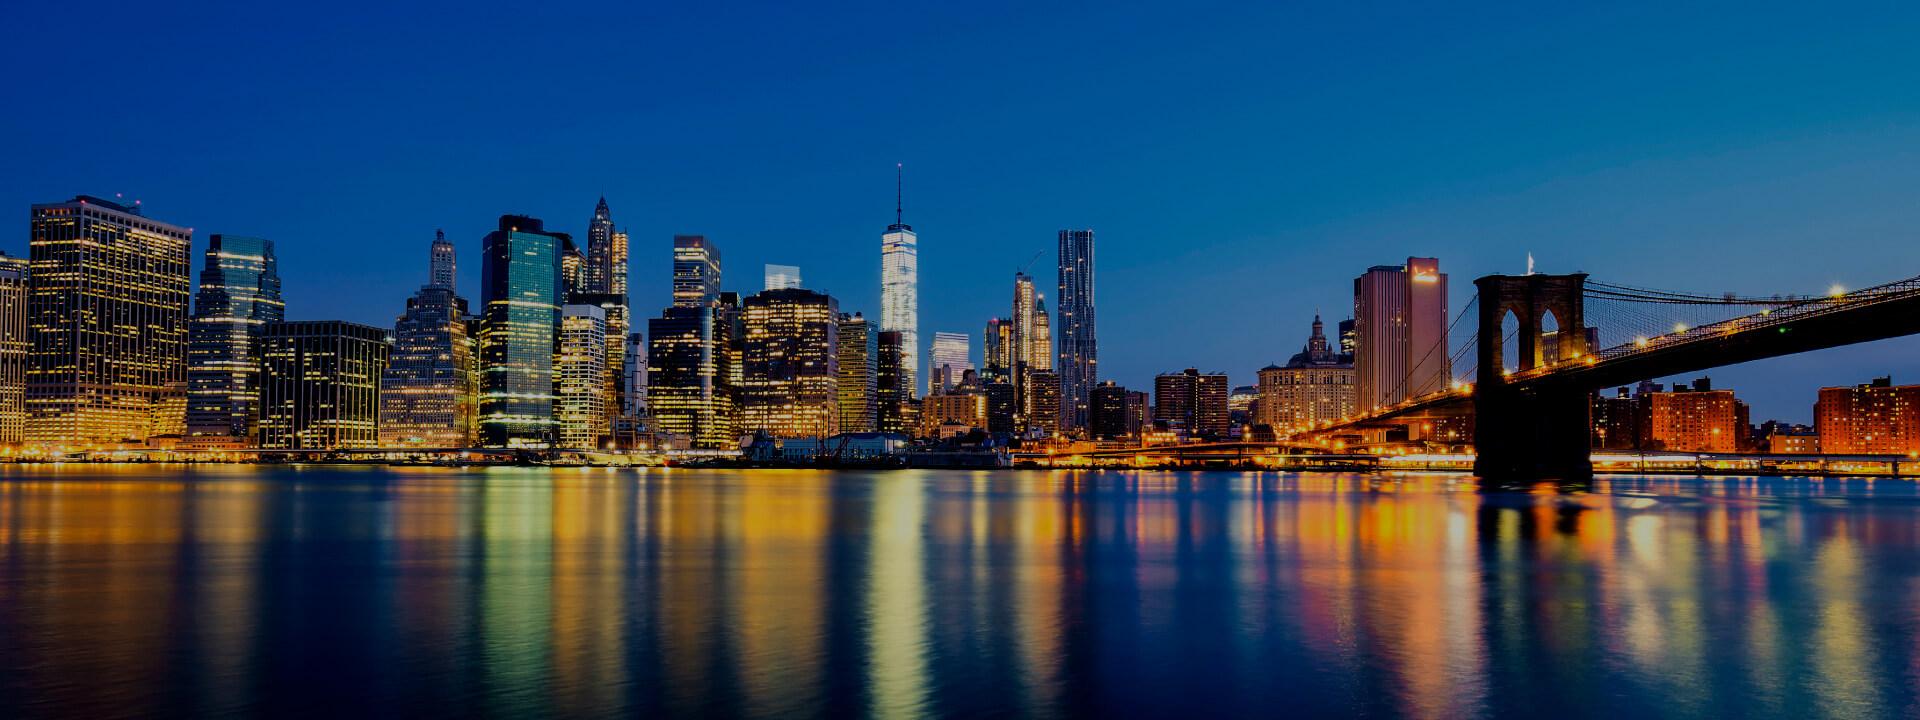 Furnished Apartments New York | Apartment Rentals - Blueground